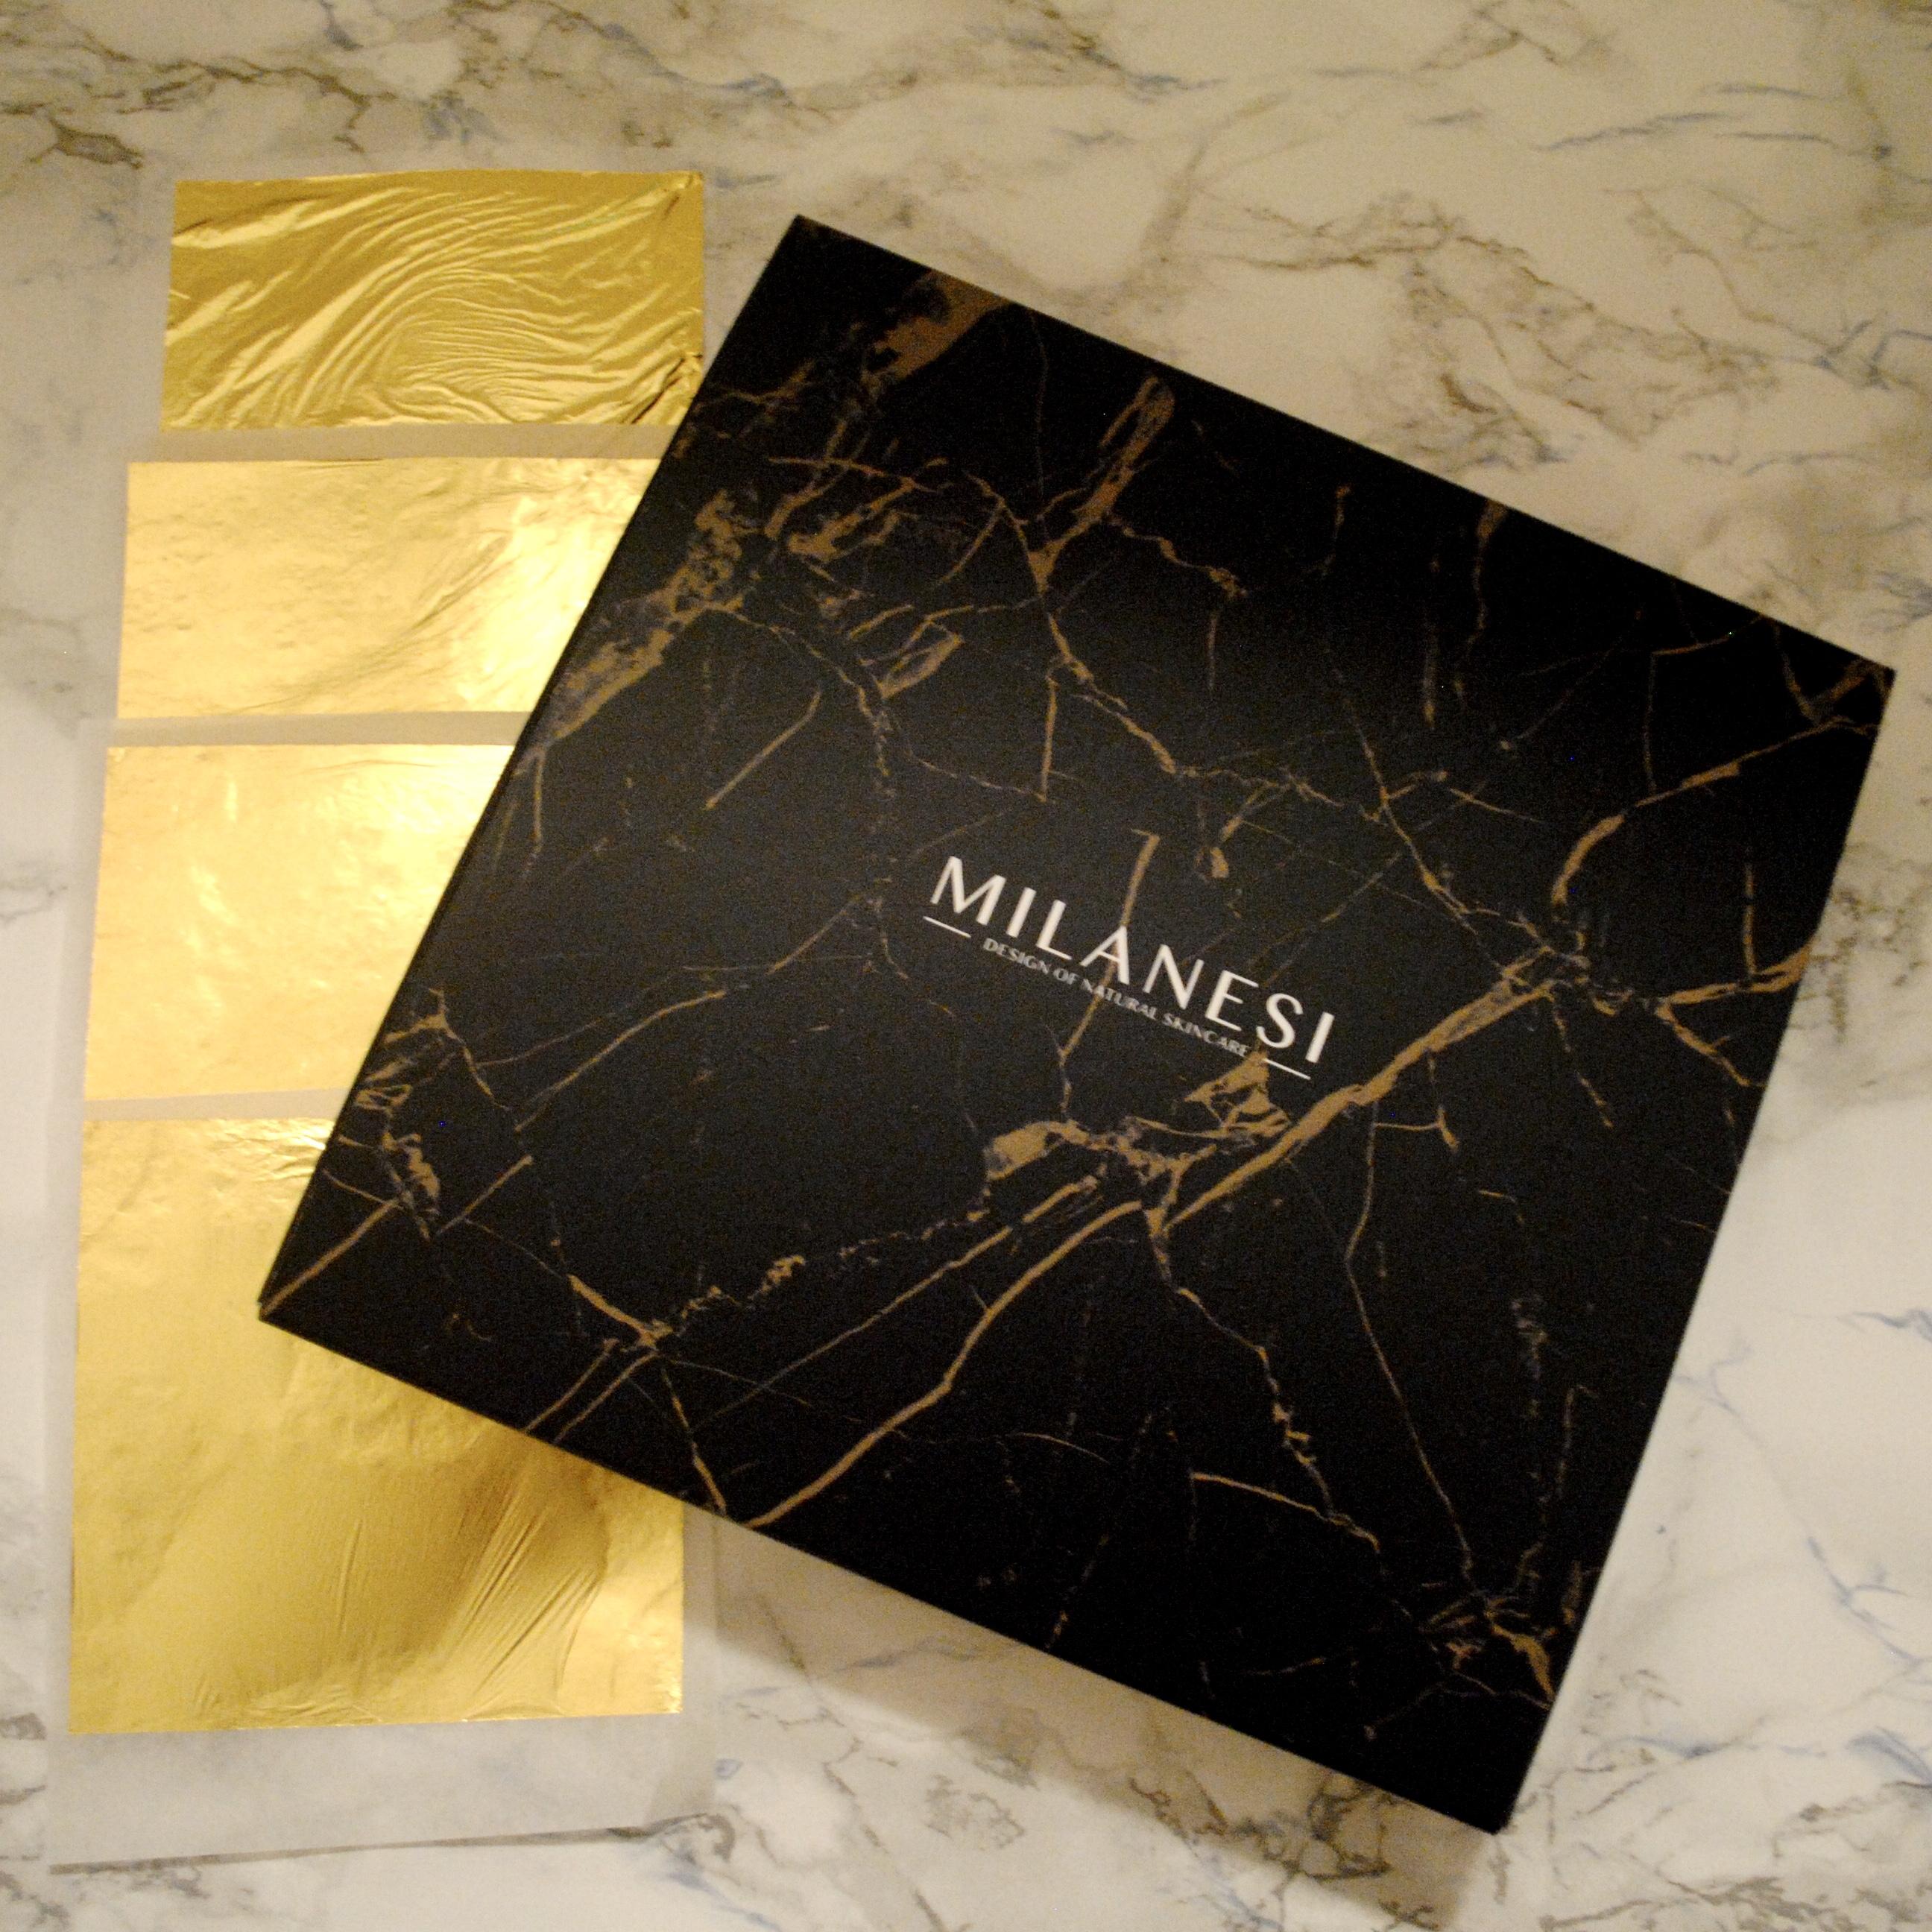 Foglie d'oro puro Milanesi